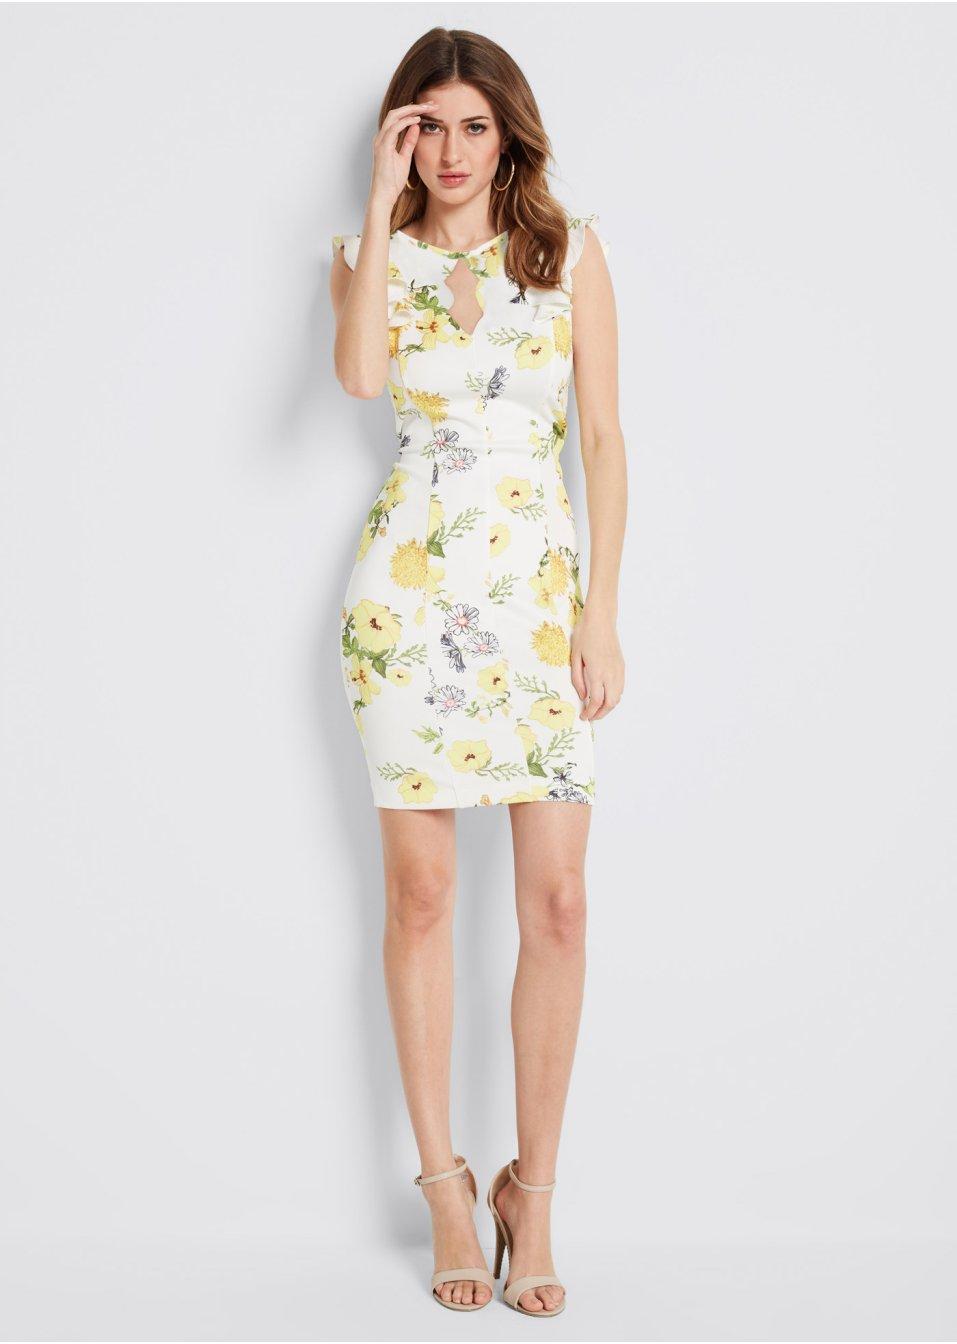 Kleid mit Blumenprint weiss/gelb/grün geblümt - BODYFLIRT ...